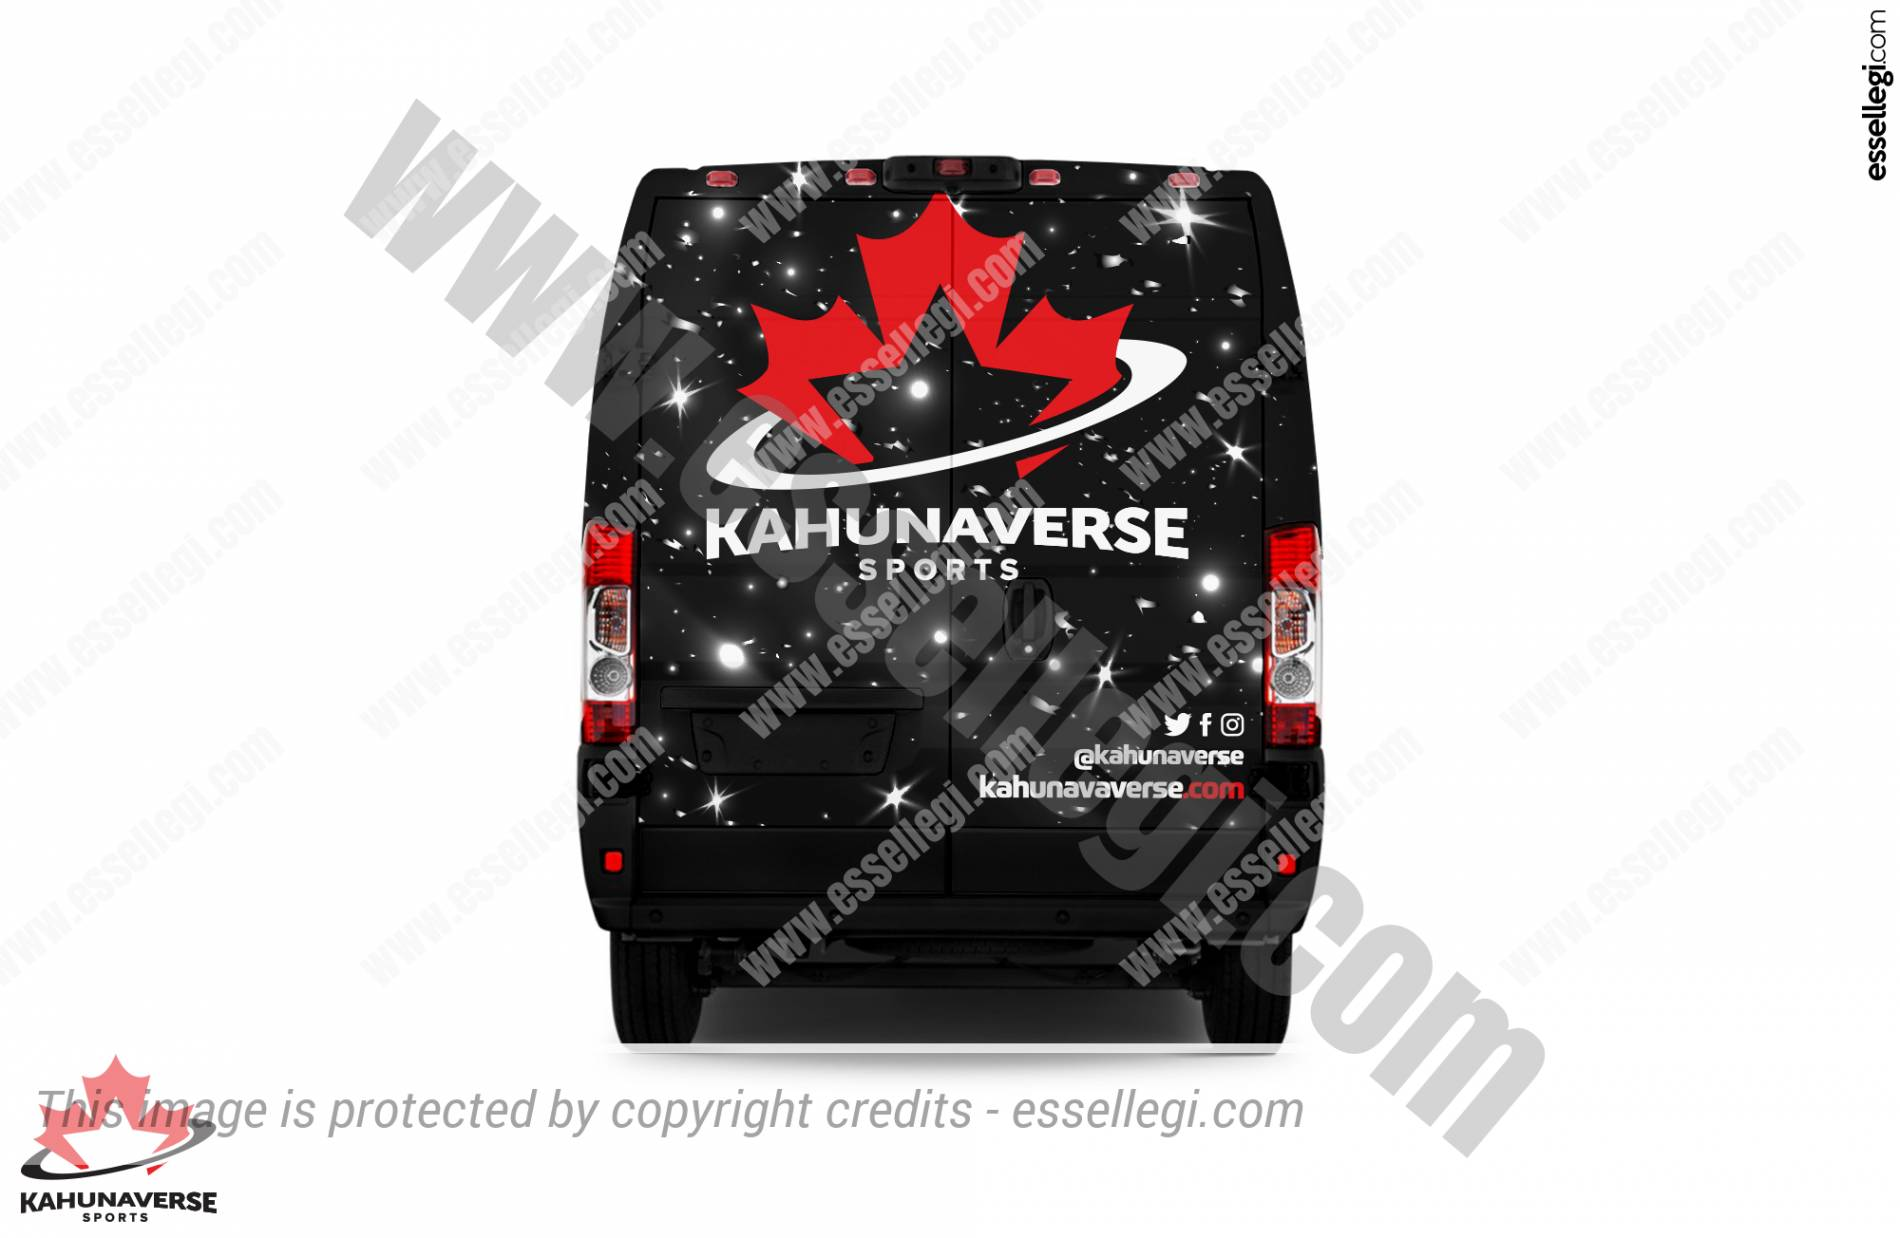 Dodge RAM ProMaster Wrap Design. Dodge RAM ProMaster | Van Wrap Design by Essellegi. Van Signs, Van Signage, Van Wrapping, Van Signwriting, Van Wrap Designer, Signs for Van, Van Logo, Van Graphic by Essellegi.